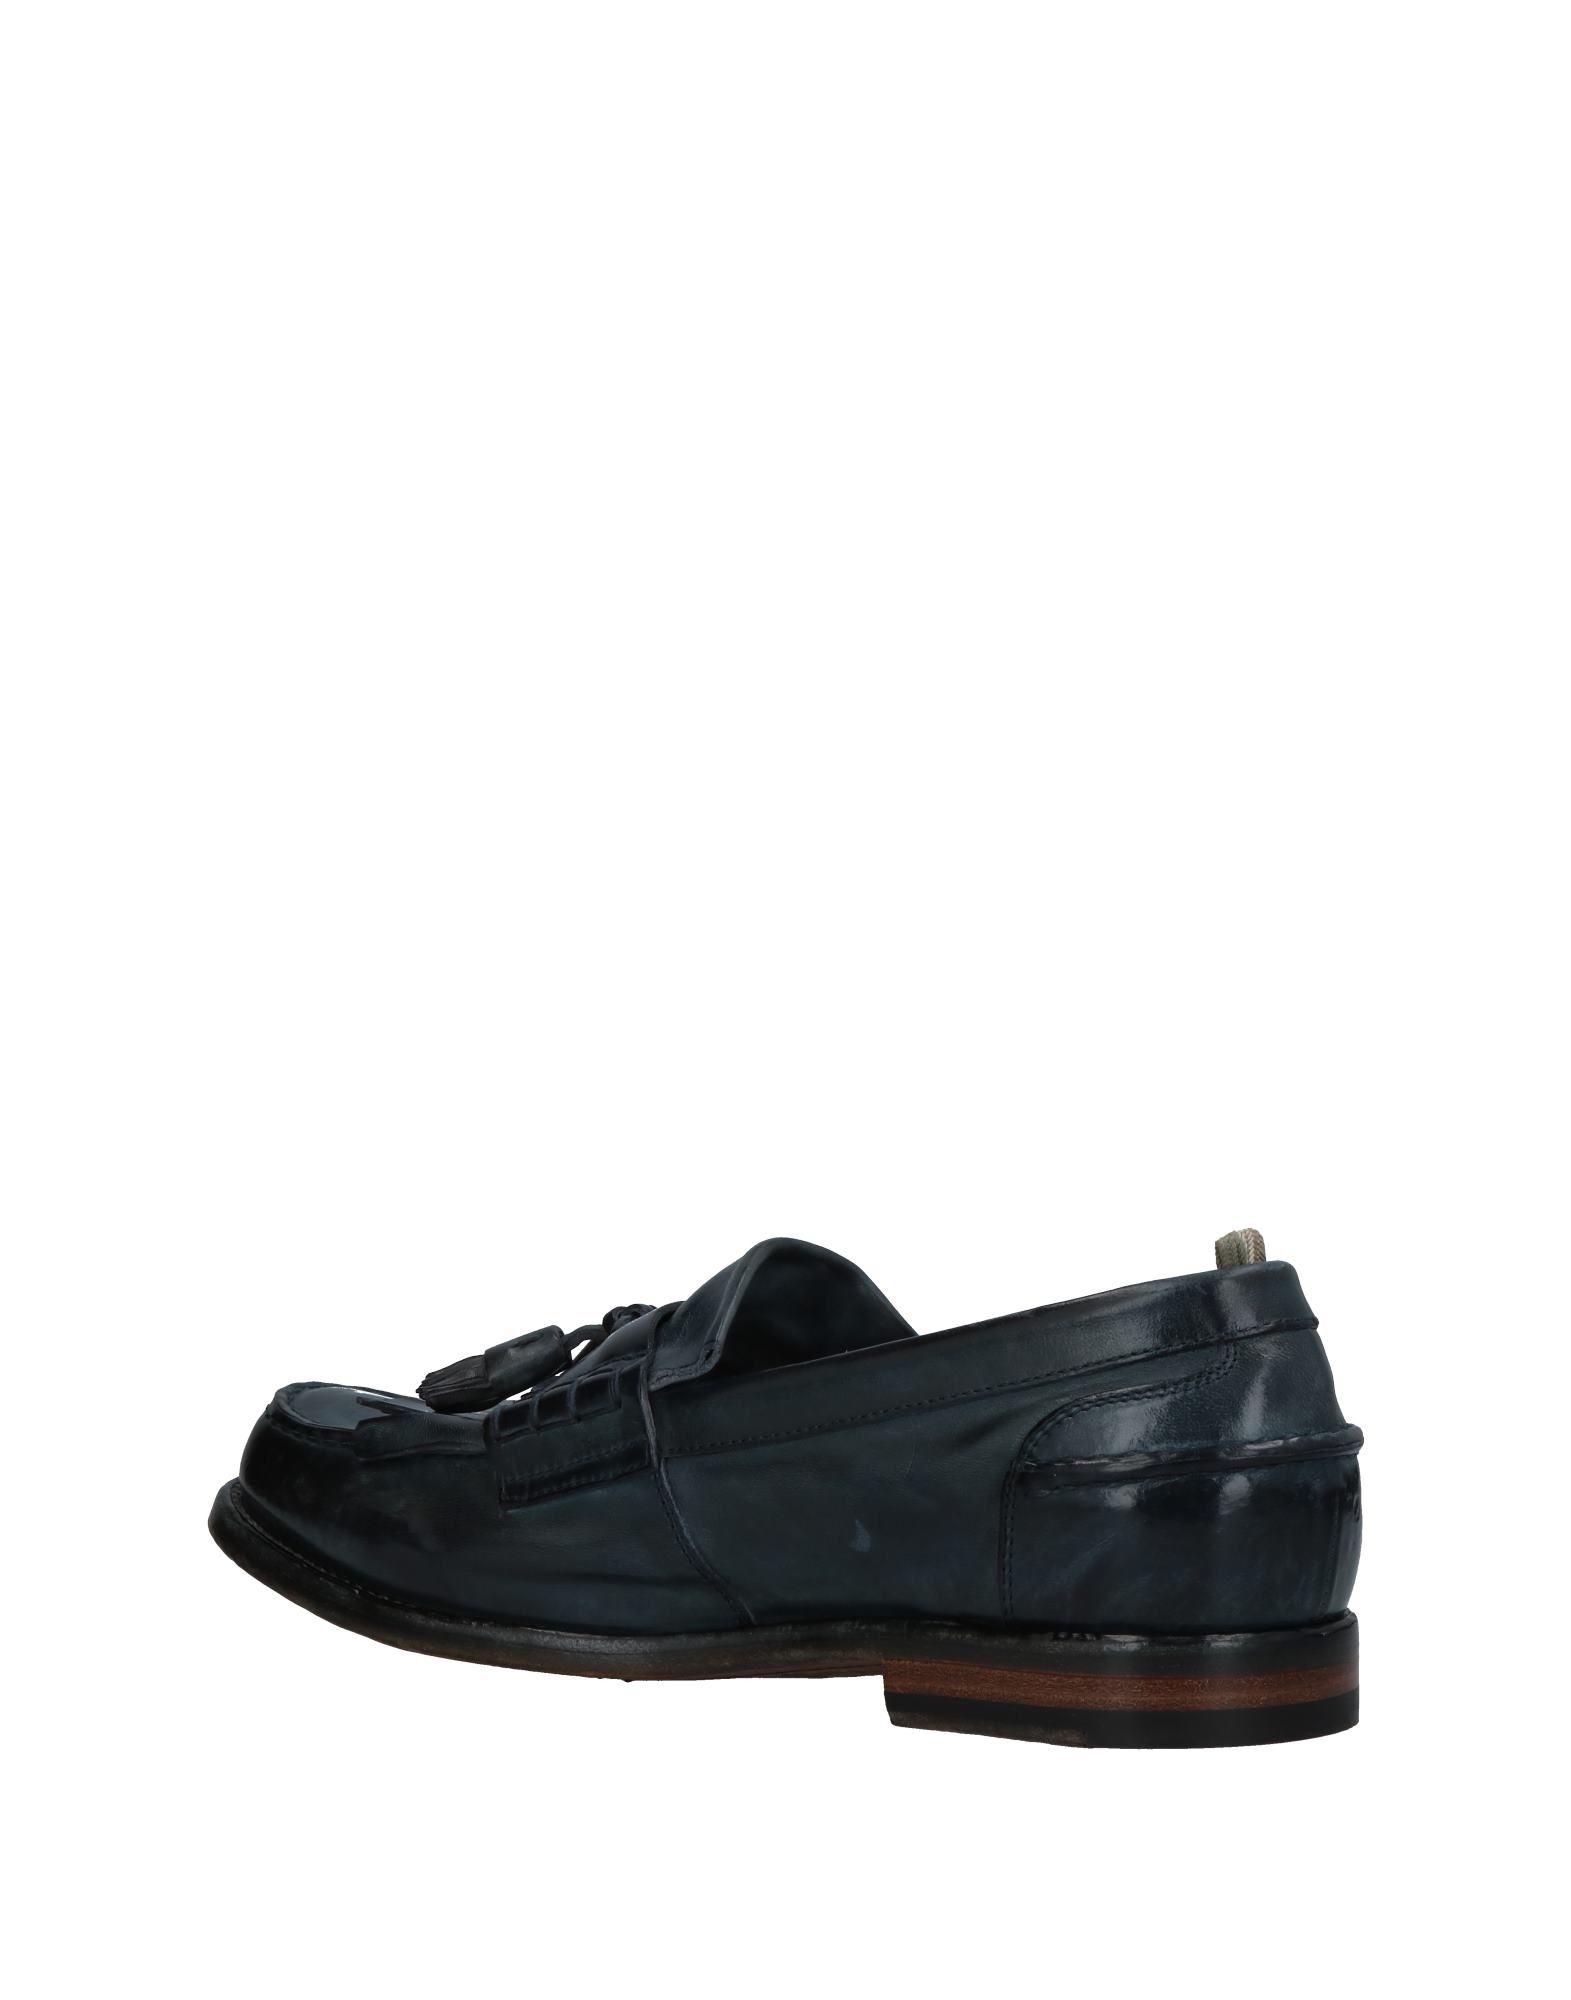 Officine Creative Italia Loafers - Men Men Men Officine Creative Italia Loafers online on  Australia - 11372476XO 4b6f48